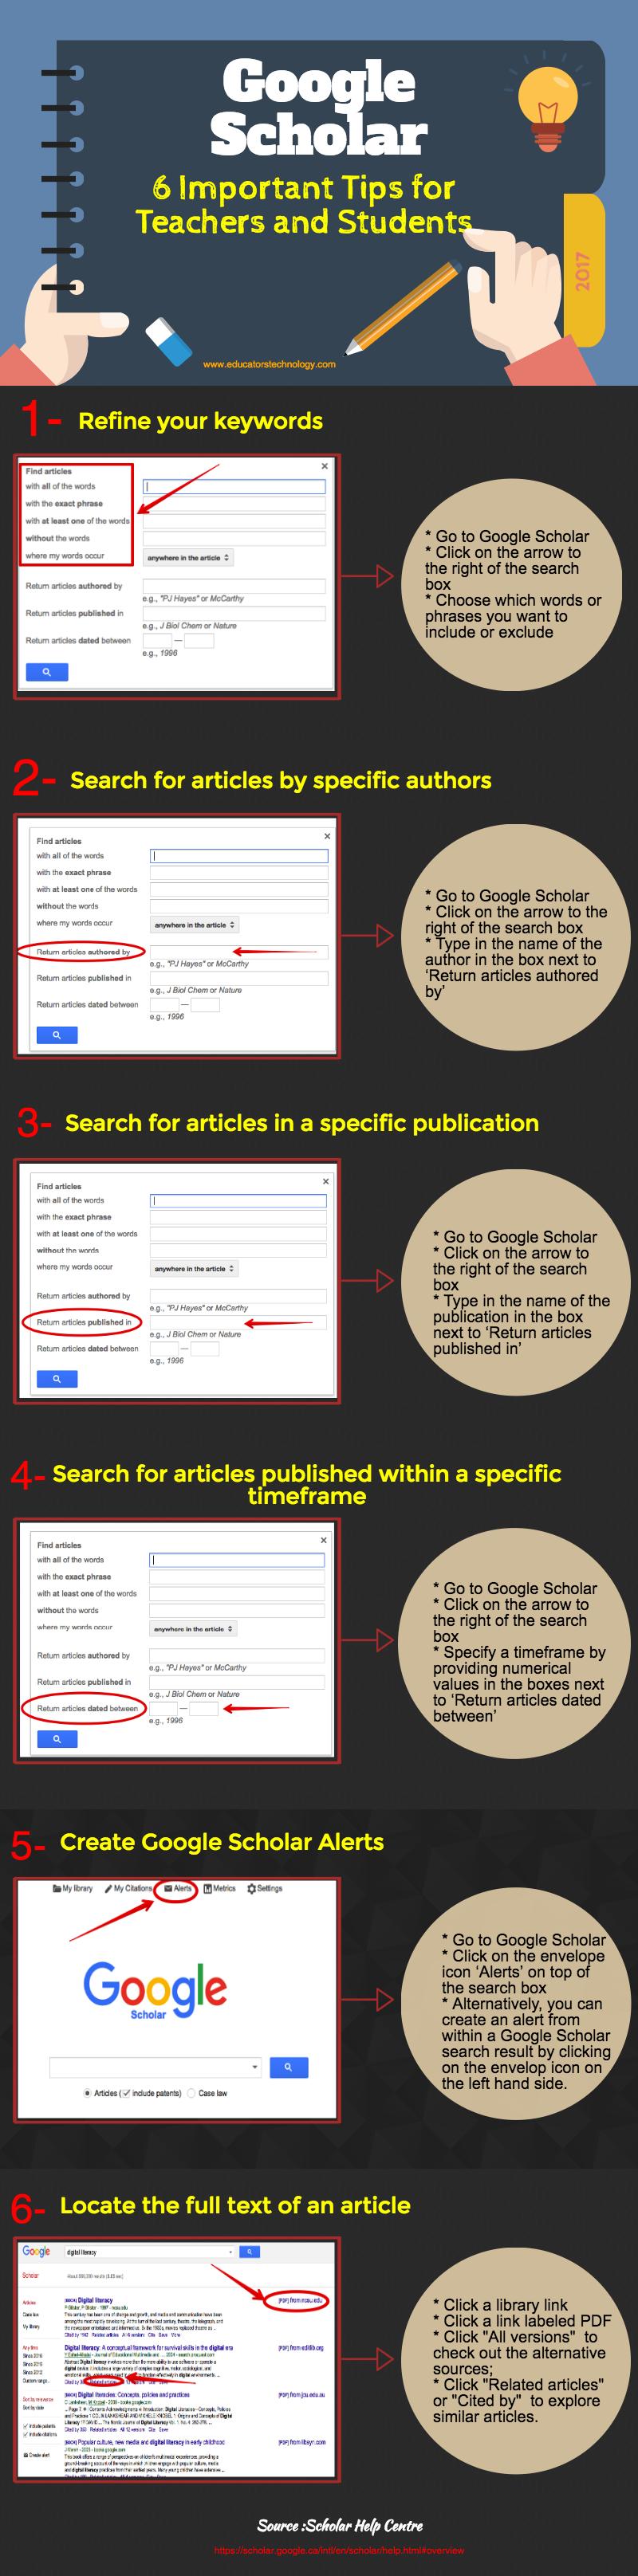 6 Basic Google Scholar Tips Every Teacher Should Know About Google Scholar Google Education Digital Literacy